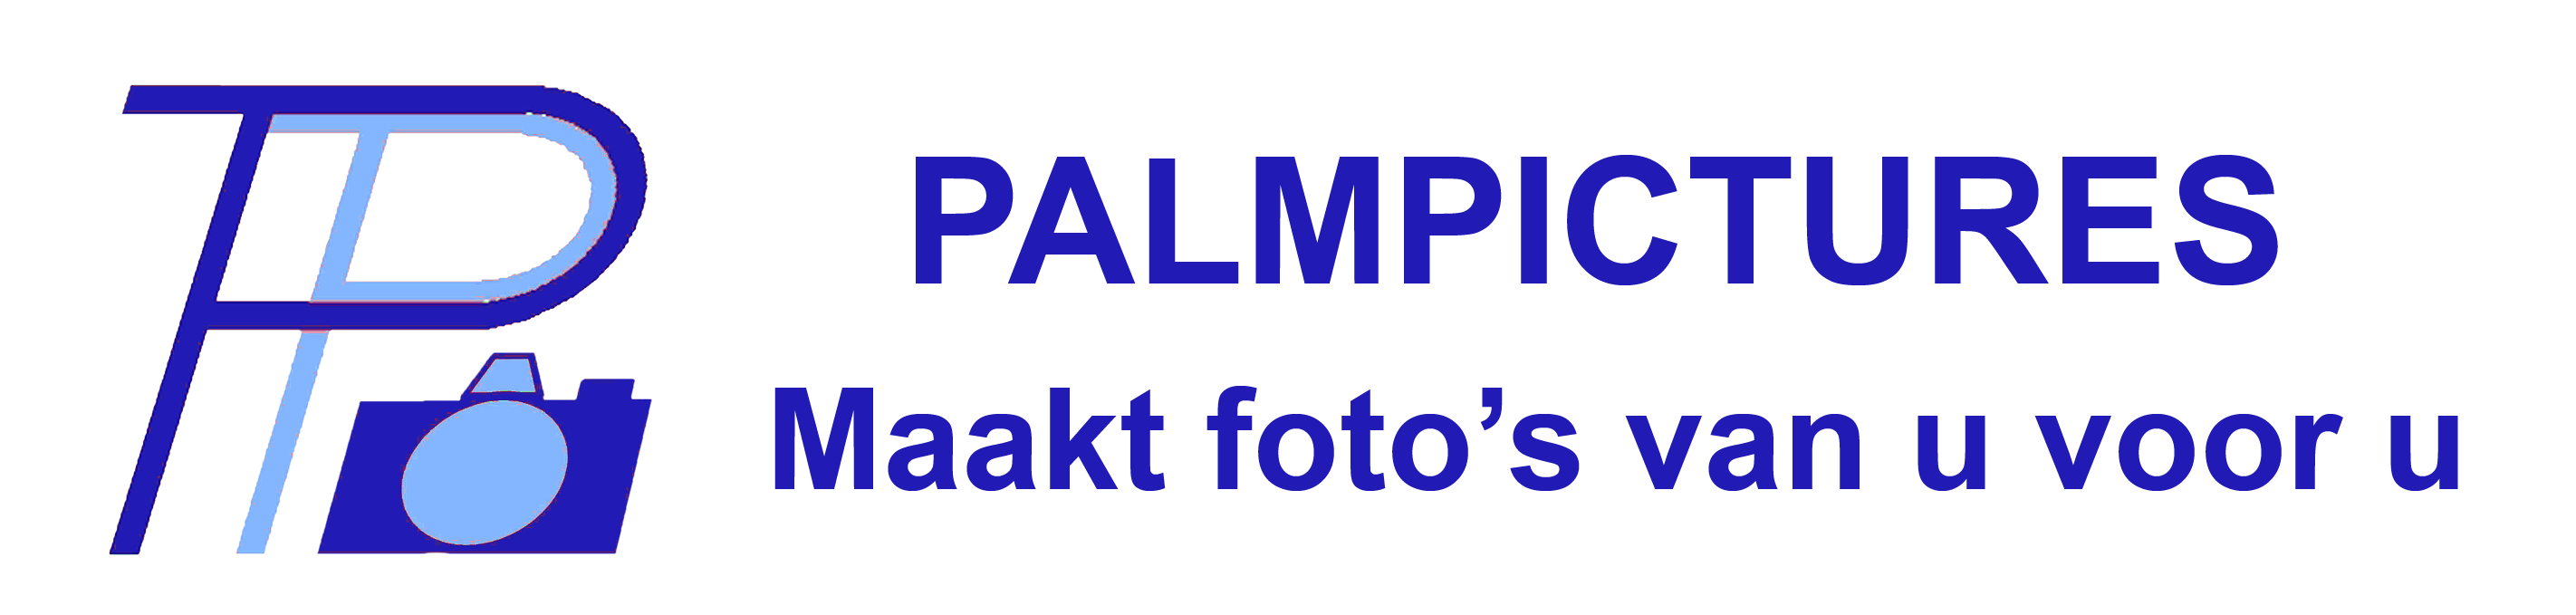 peter palm